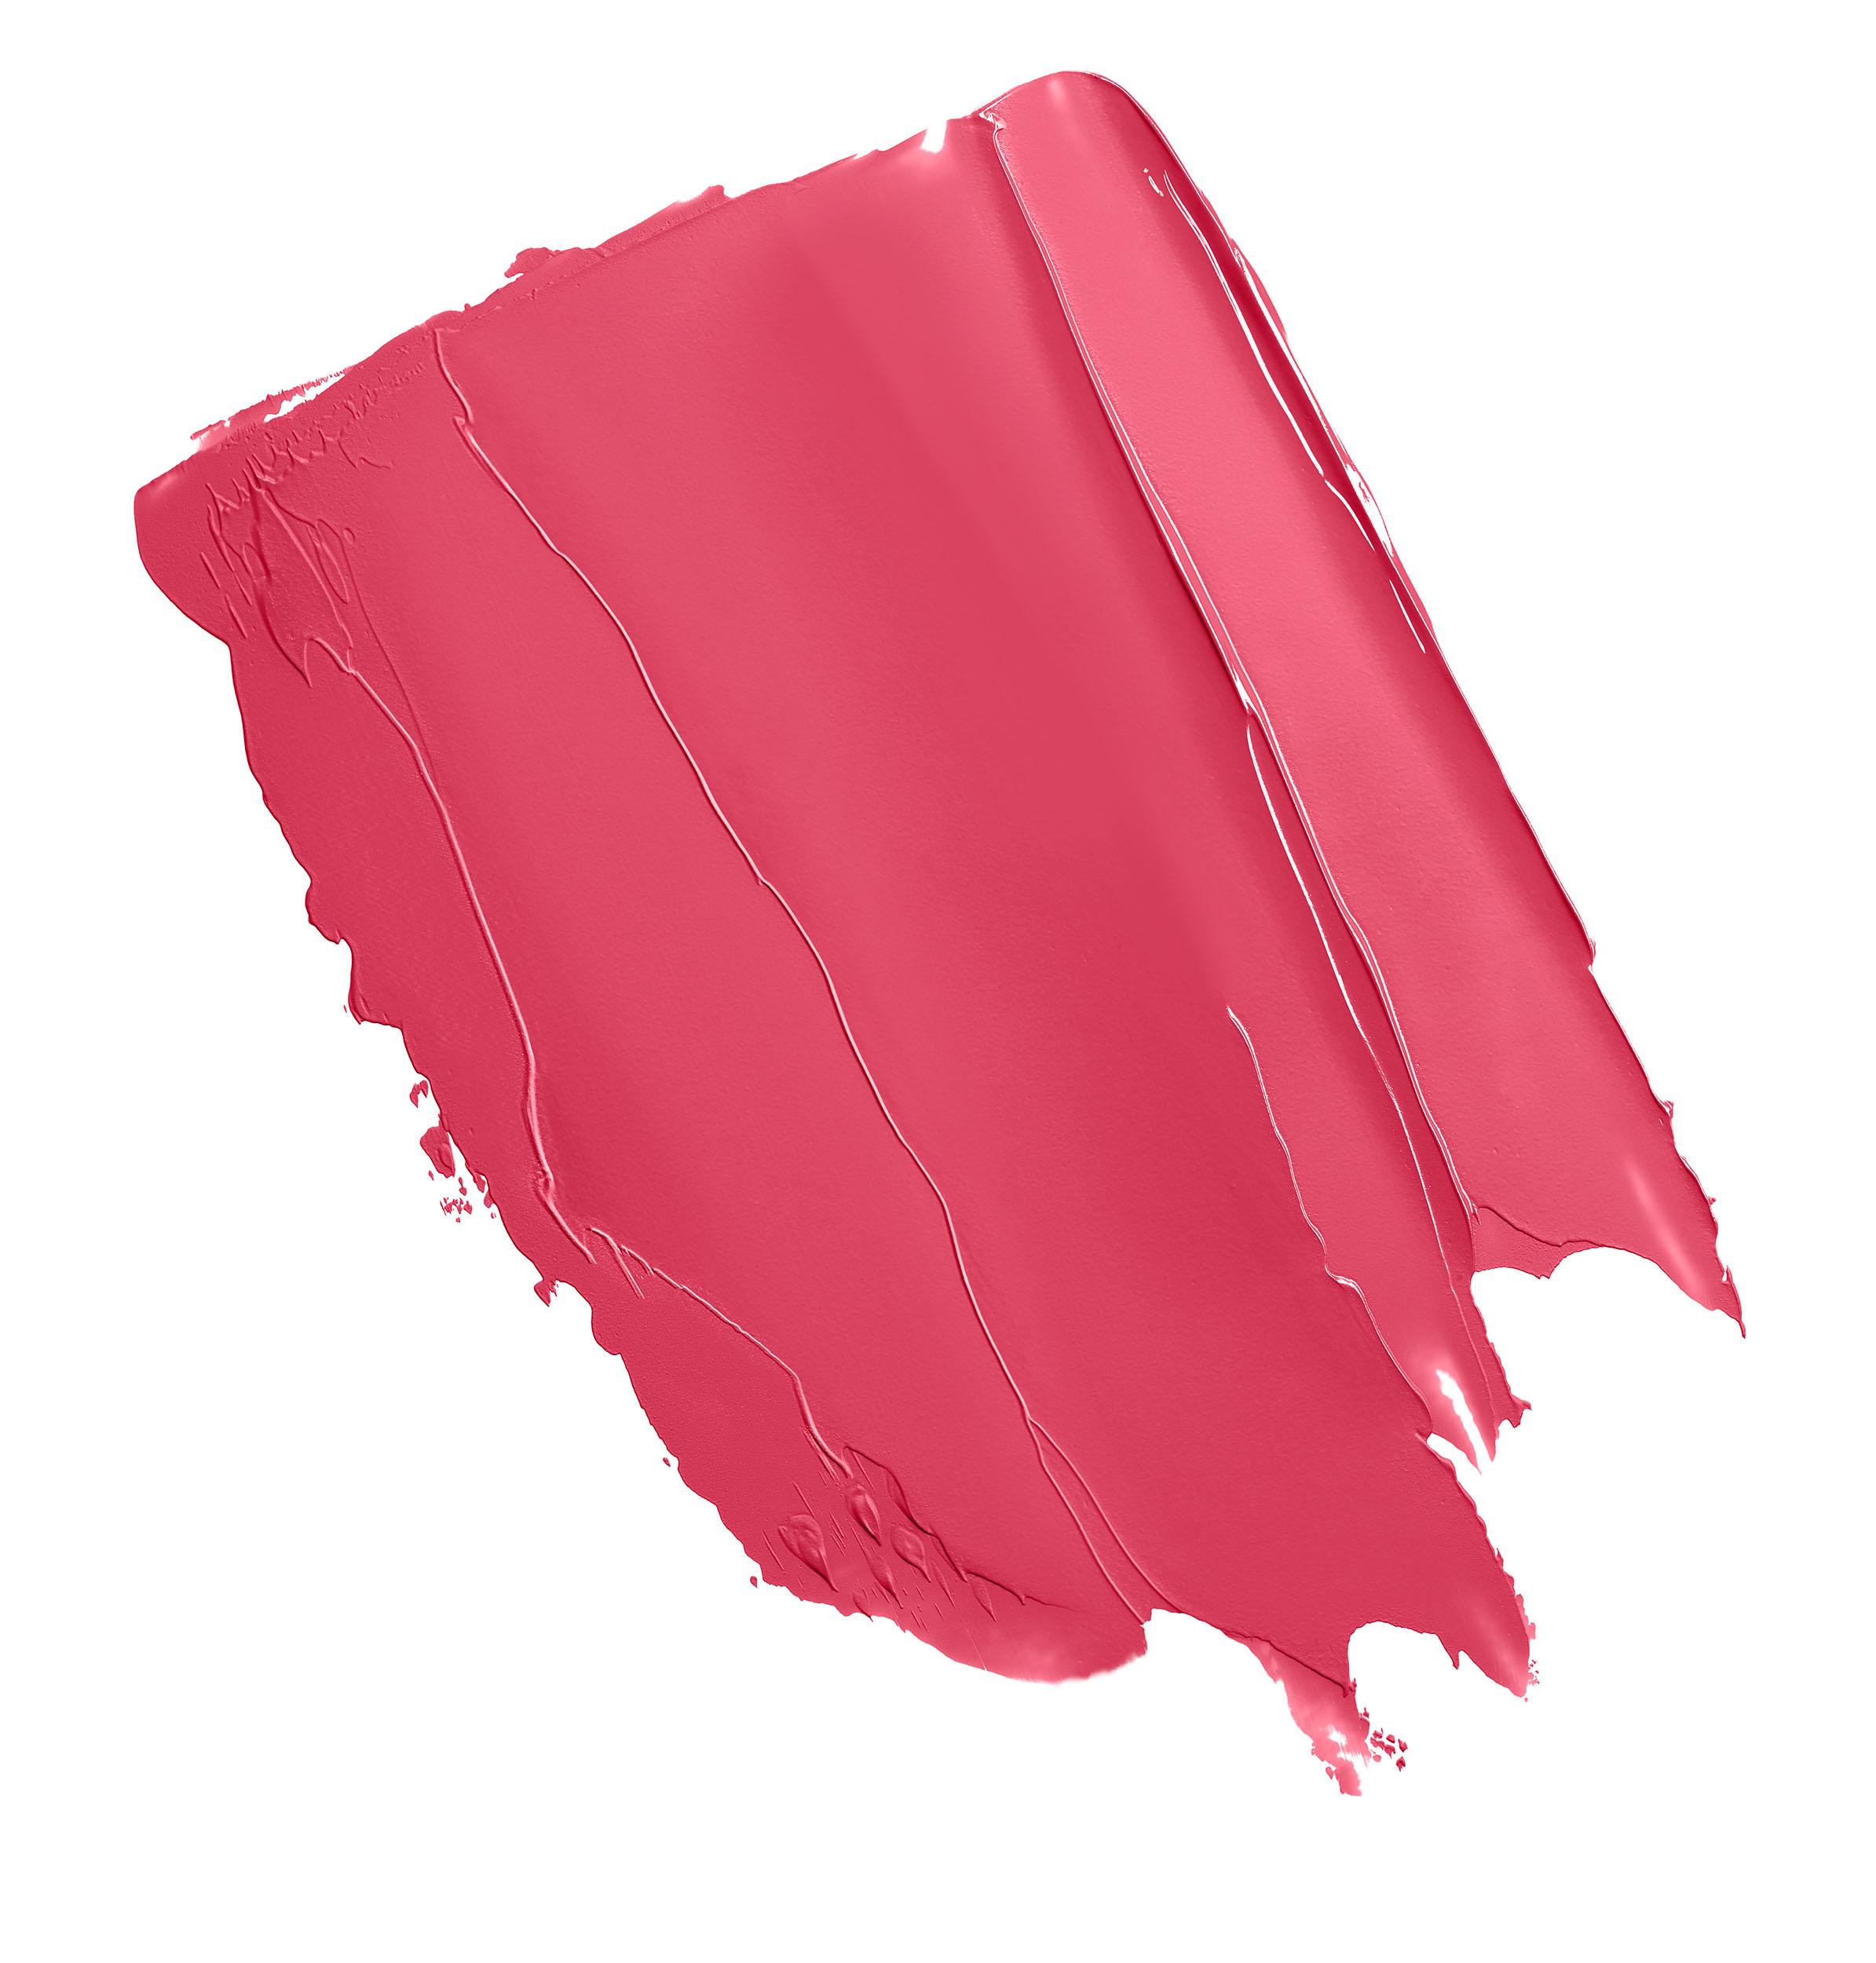 DIOR Rouge Dior Refillable Satin Lipstick, 766 rose harpers